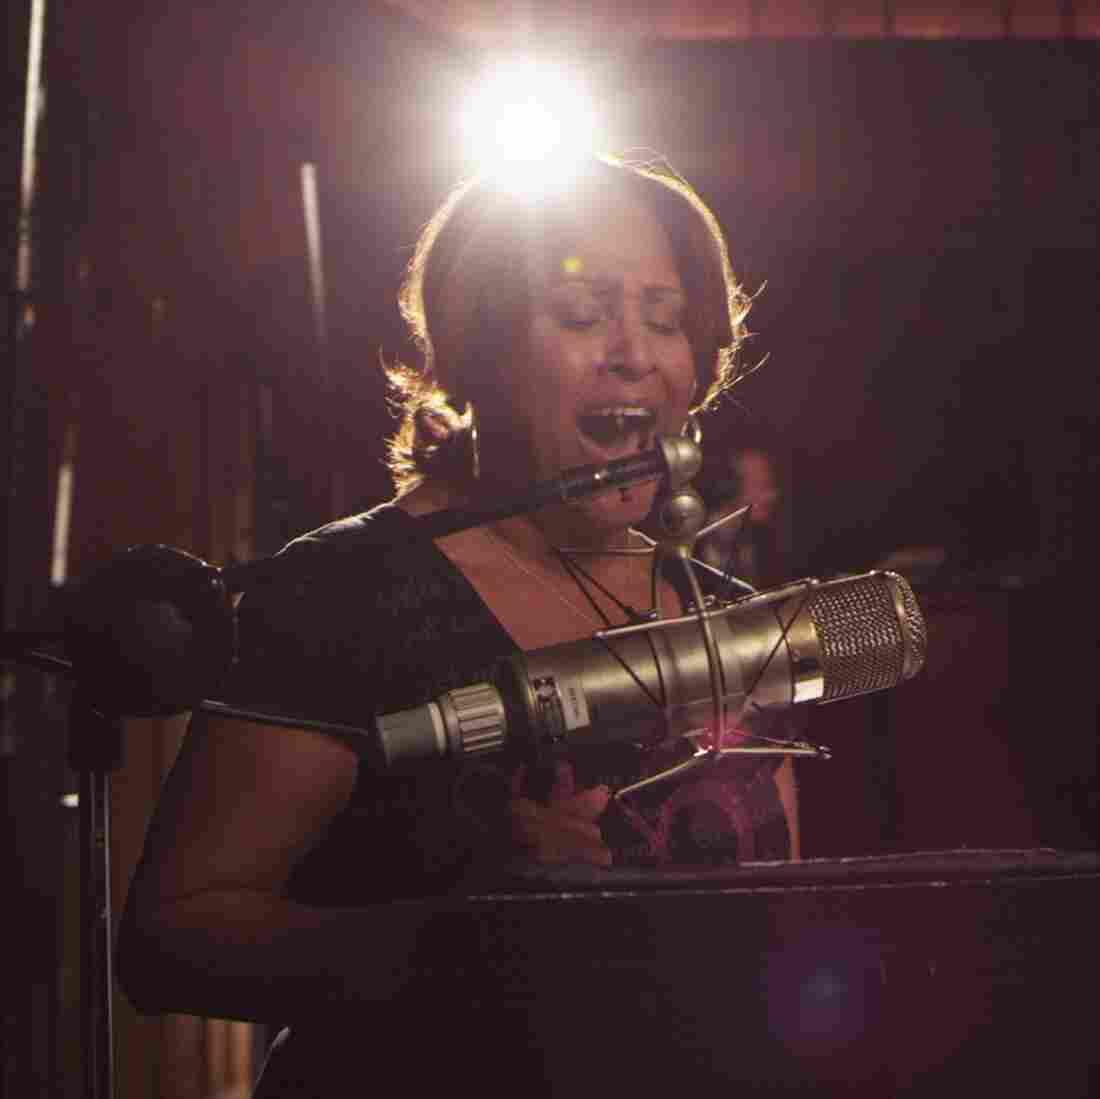 Spotlighting Background Singers In 'Twenty Feet From Stardom'